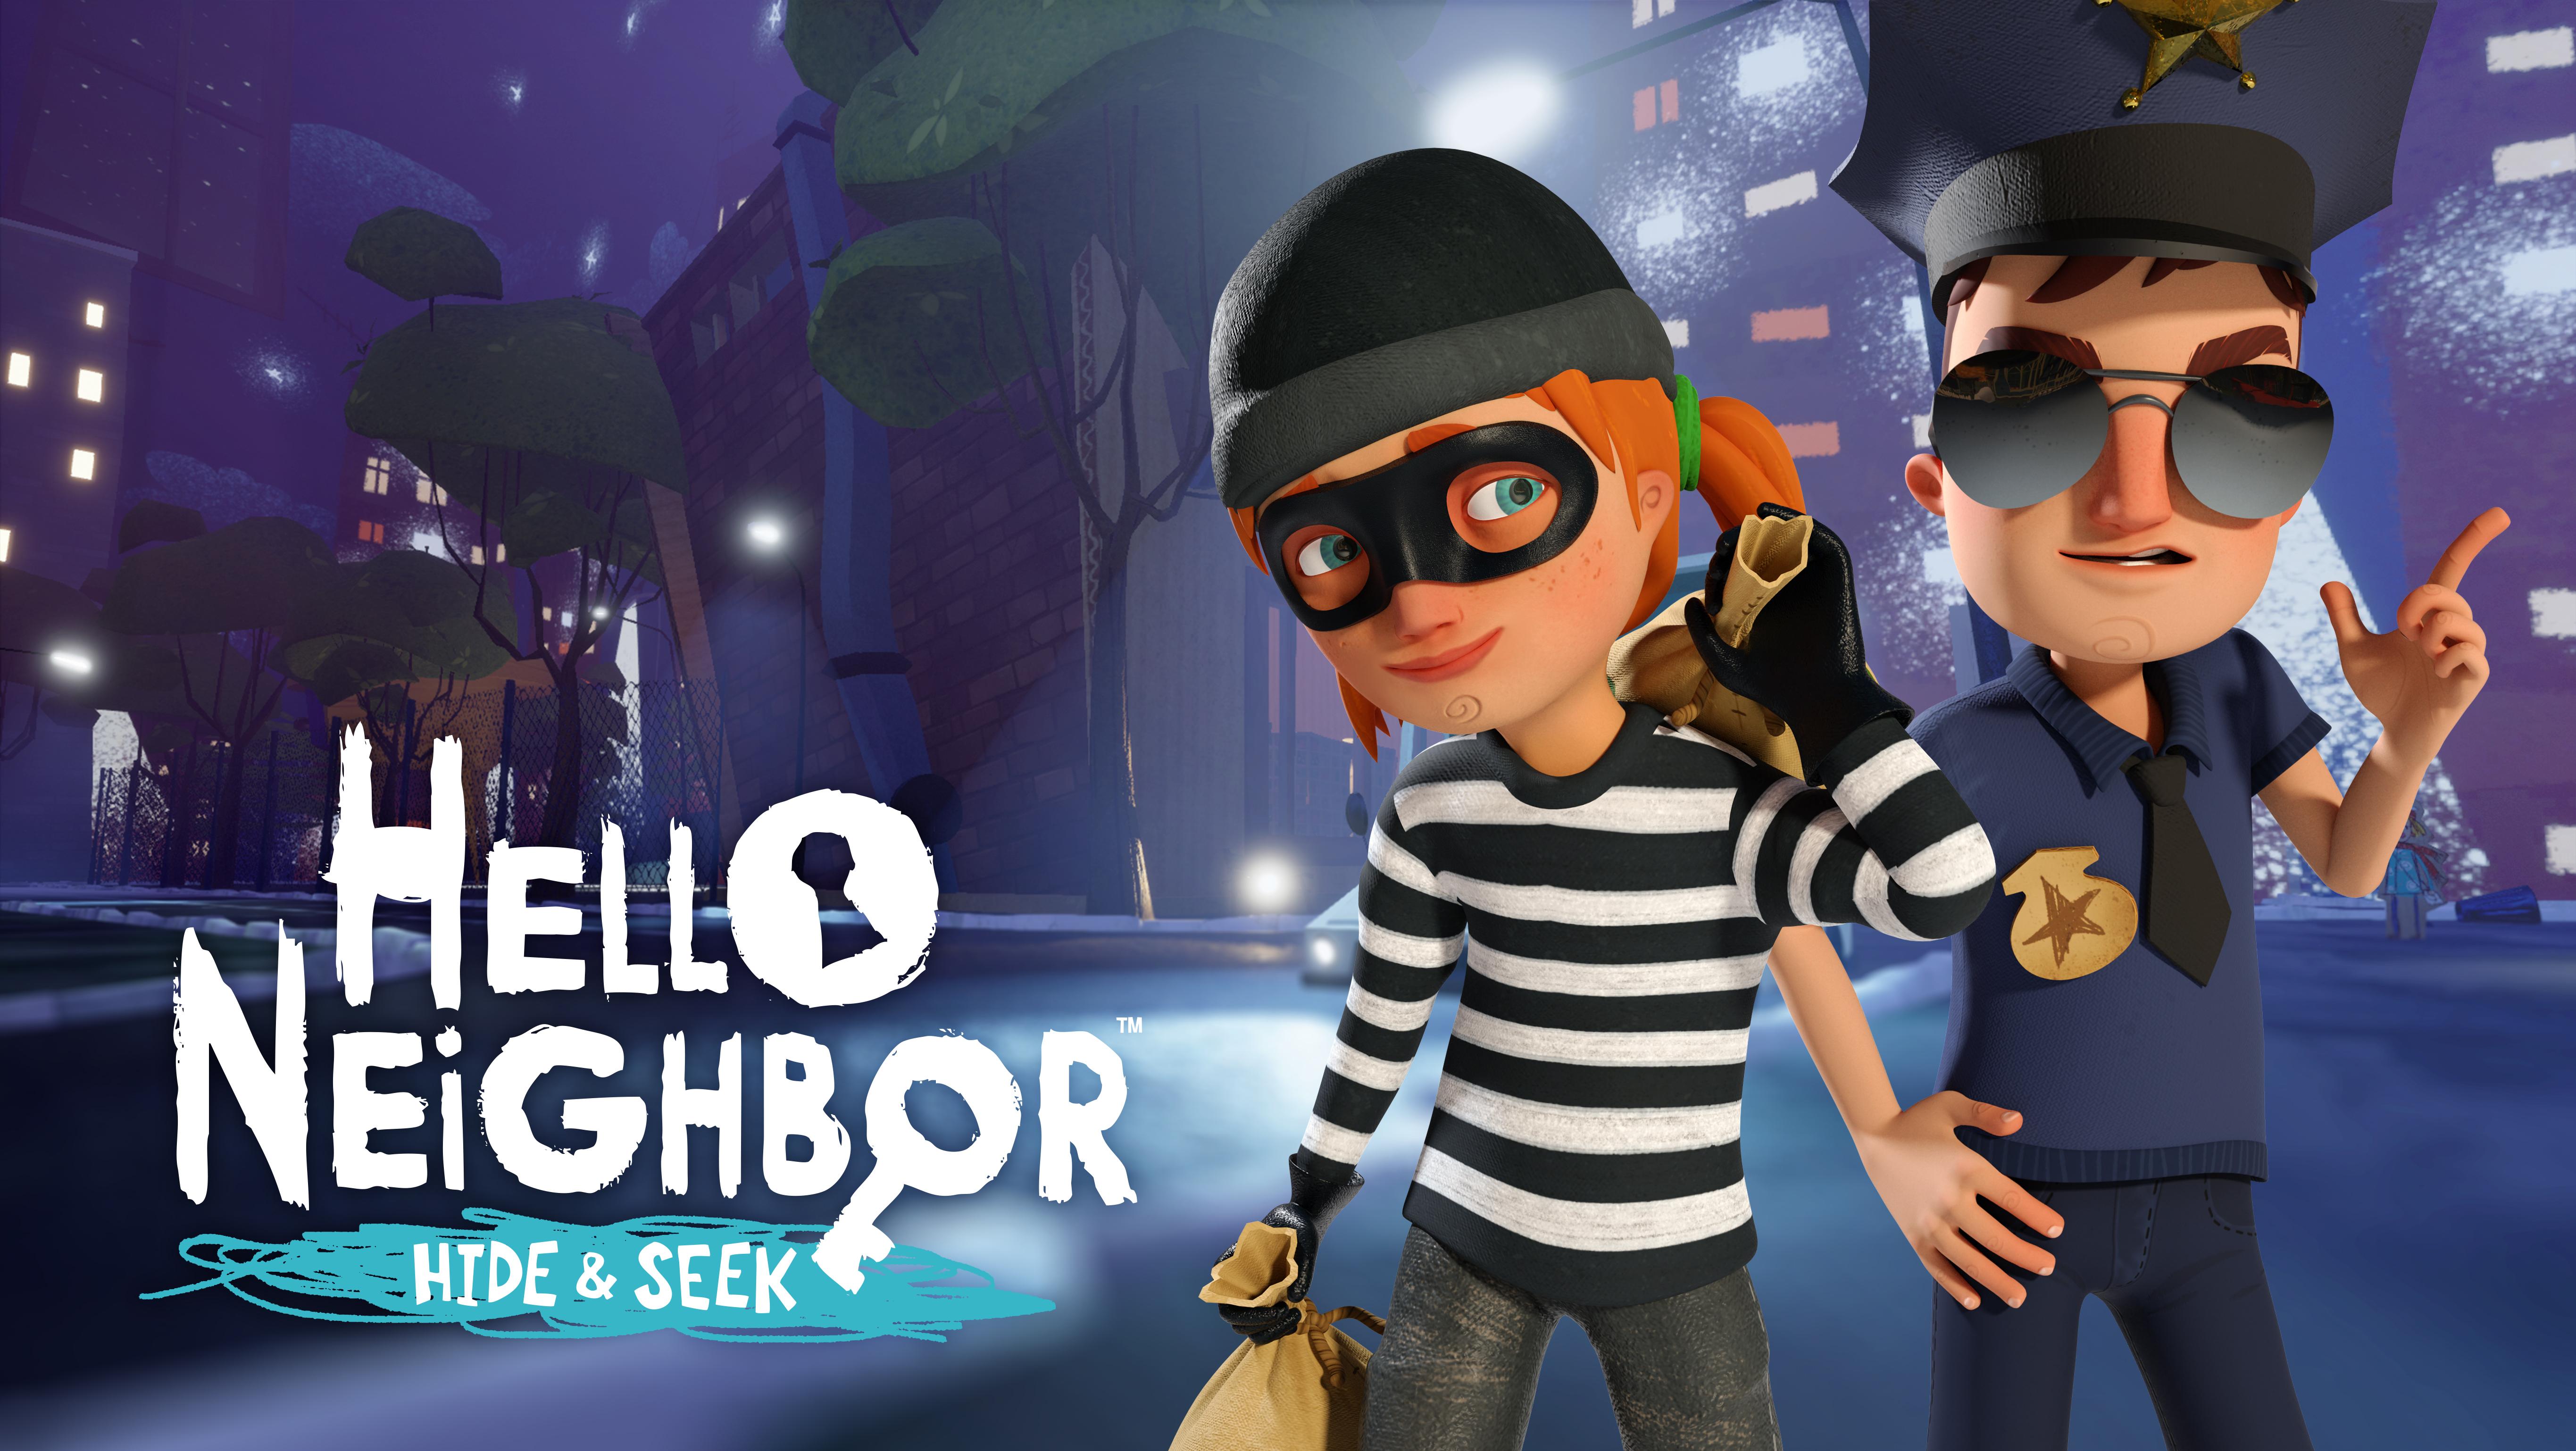 hide and seek games free download full version